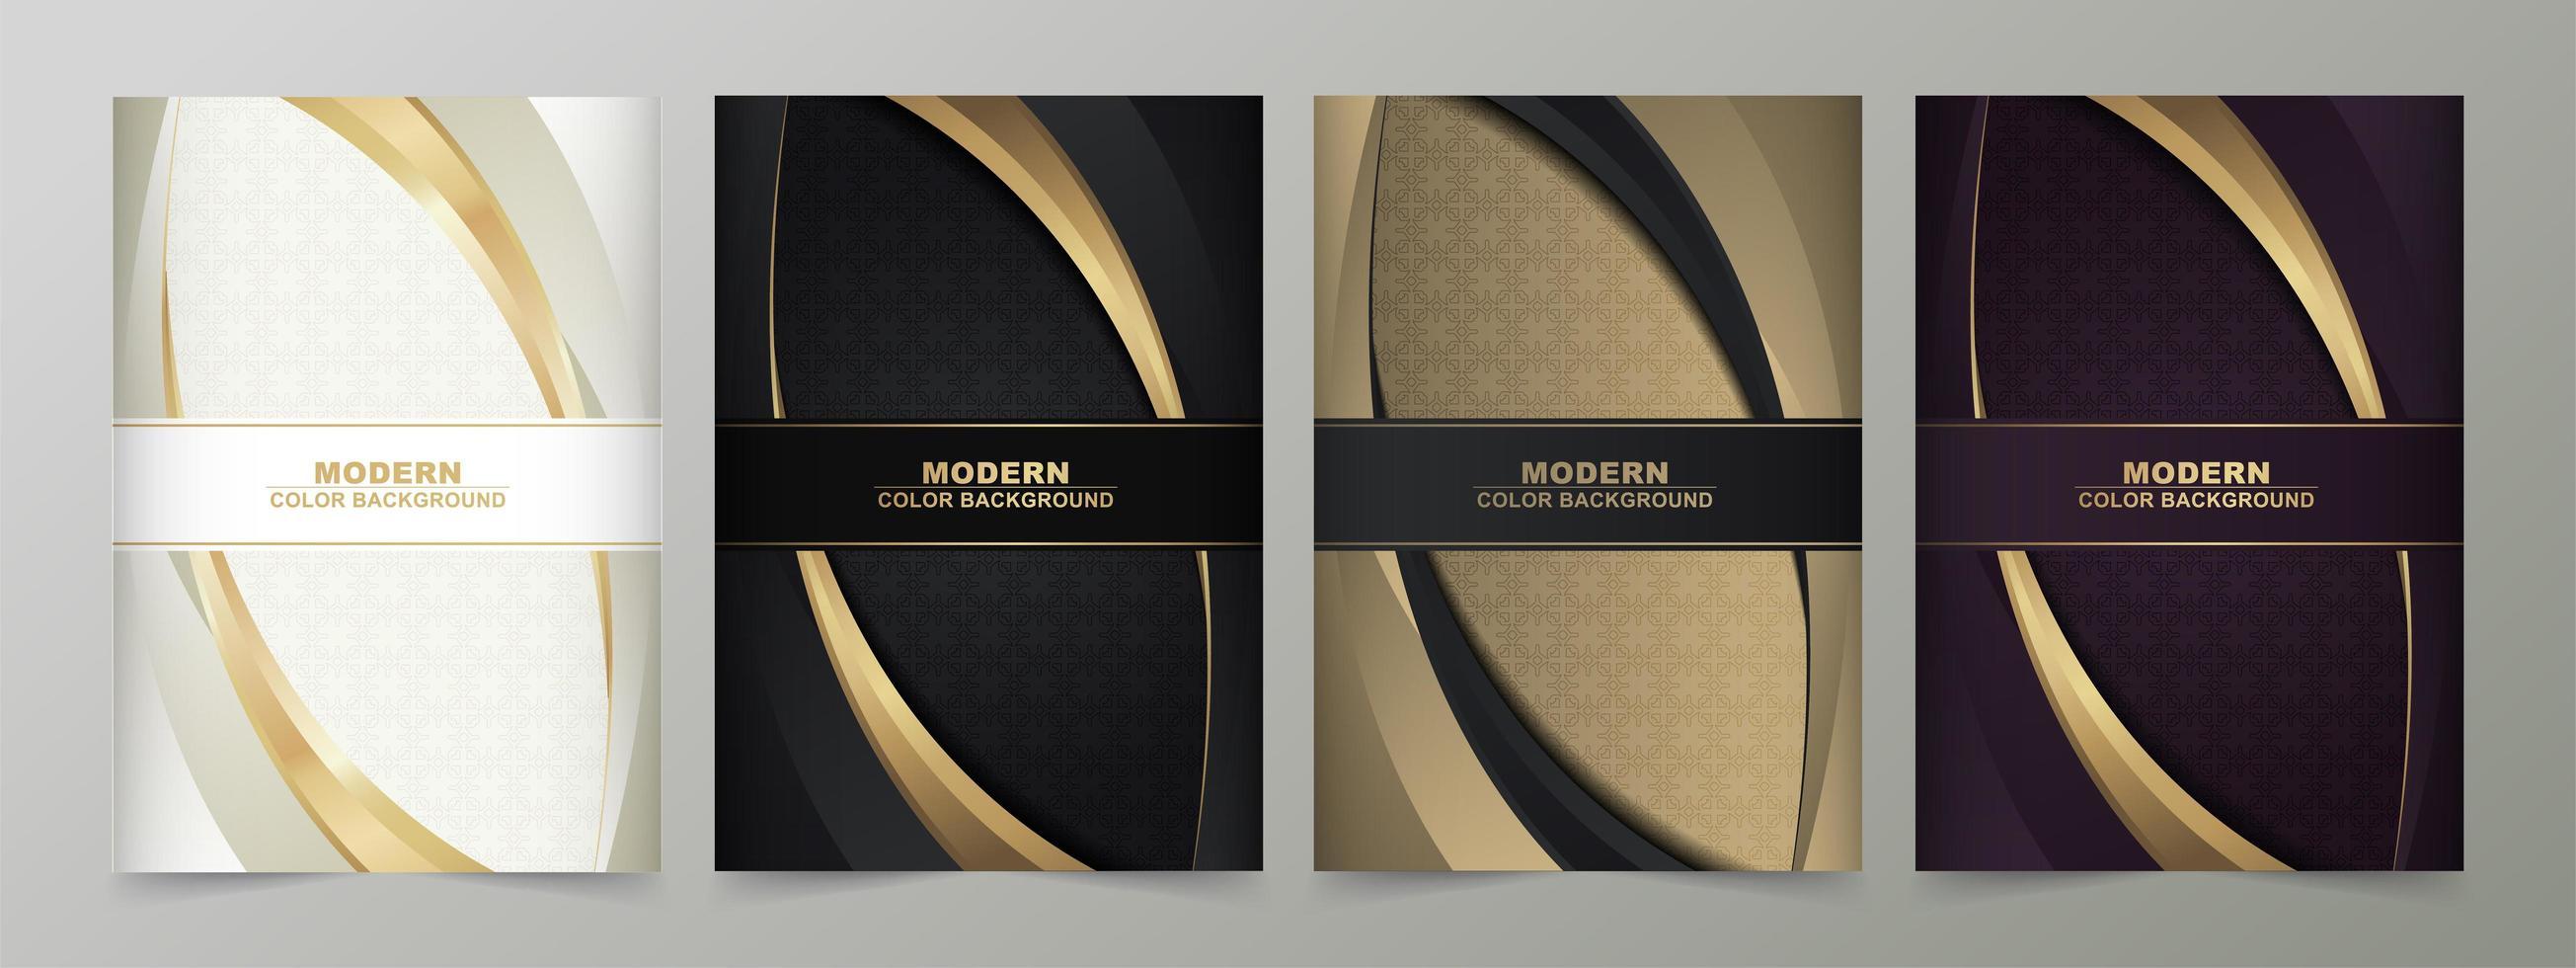 modernes dunkles und helles Musterset vektor